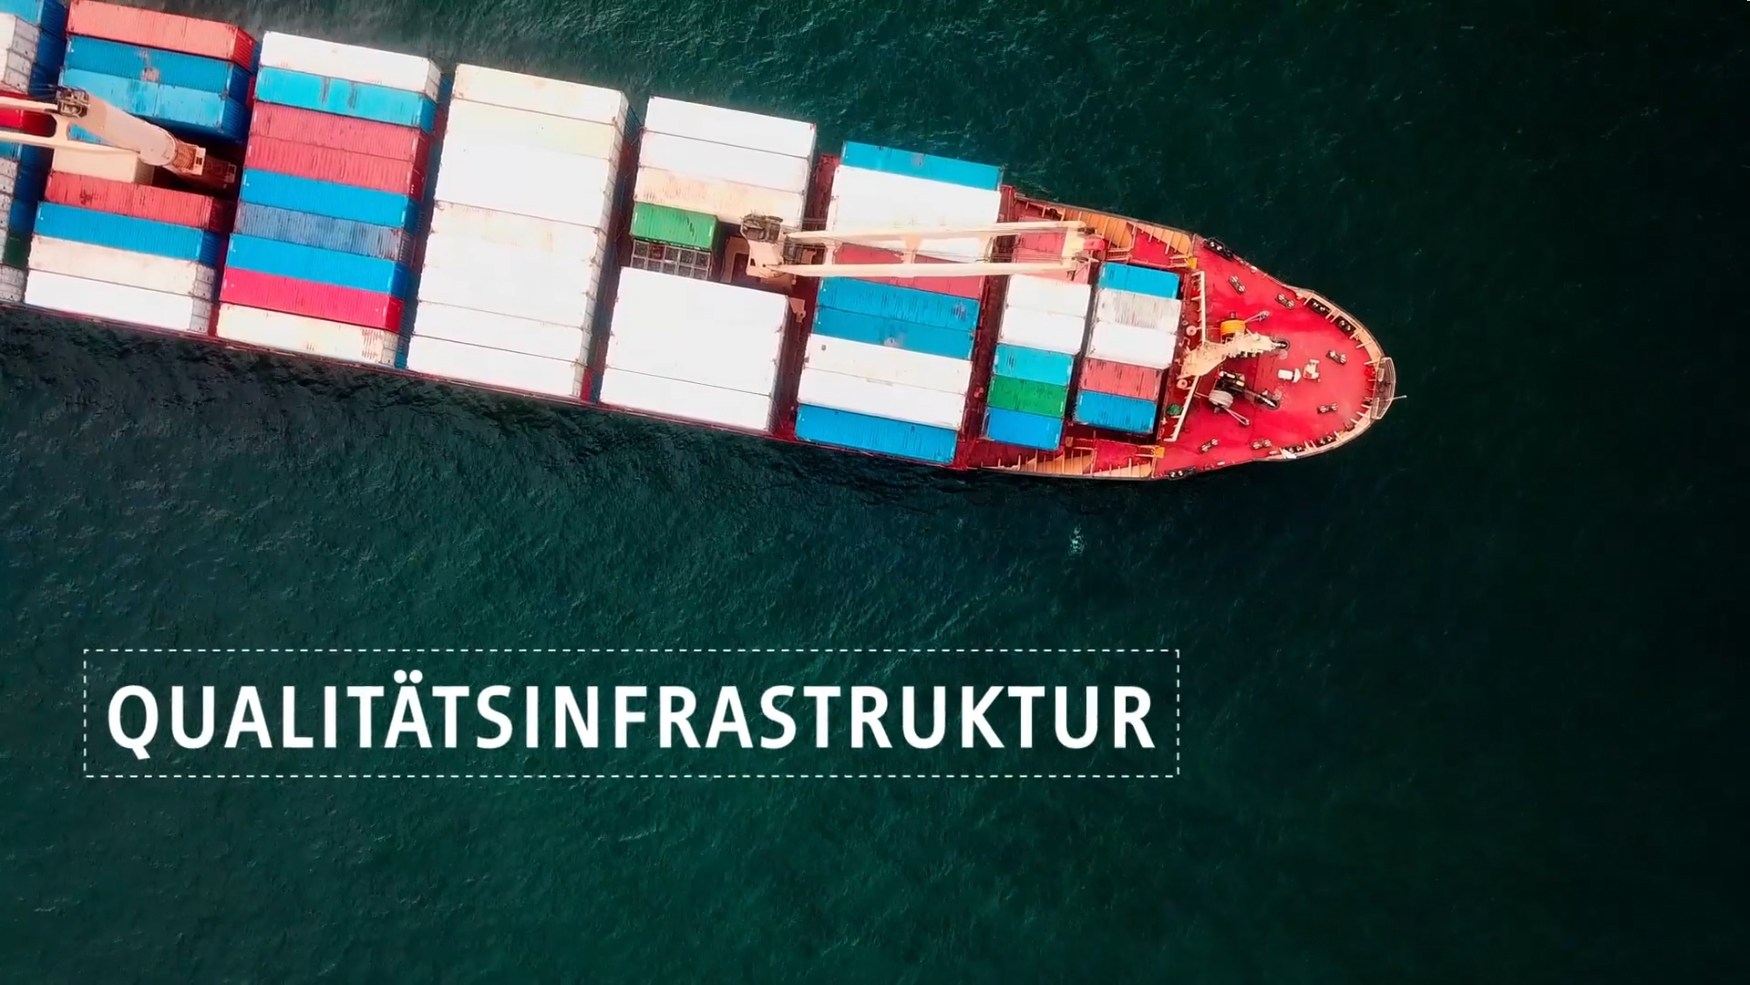 GPQI - Globalprojekt Qualittsinfrastruktur